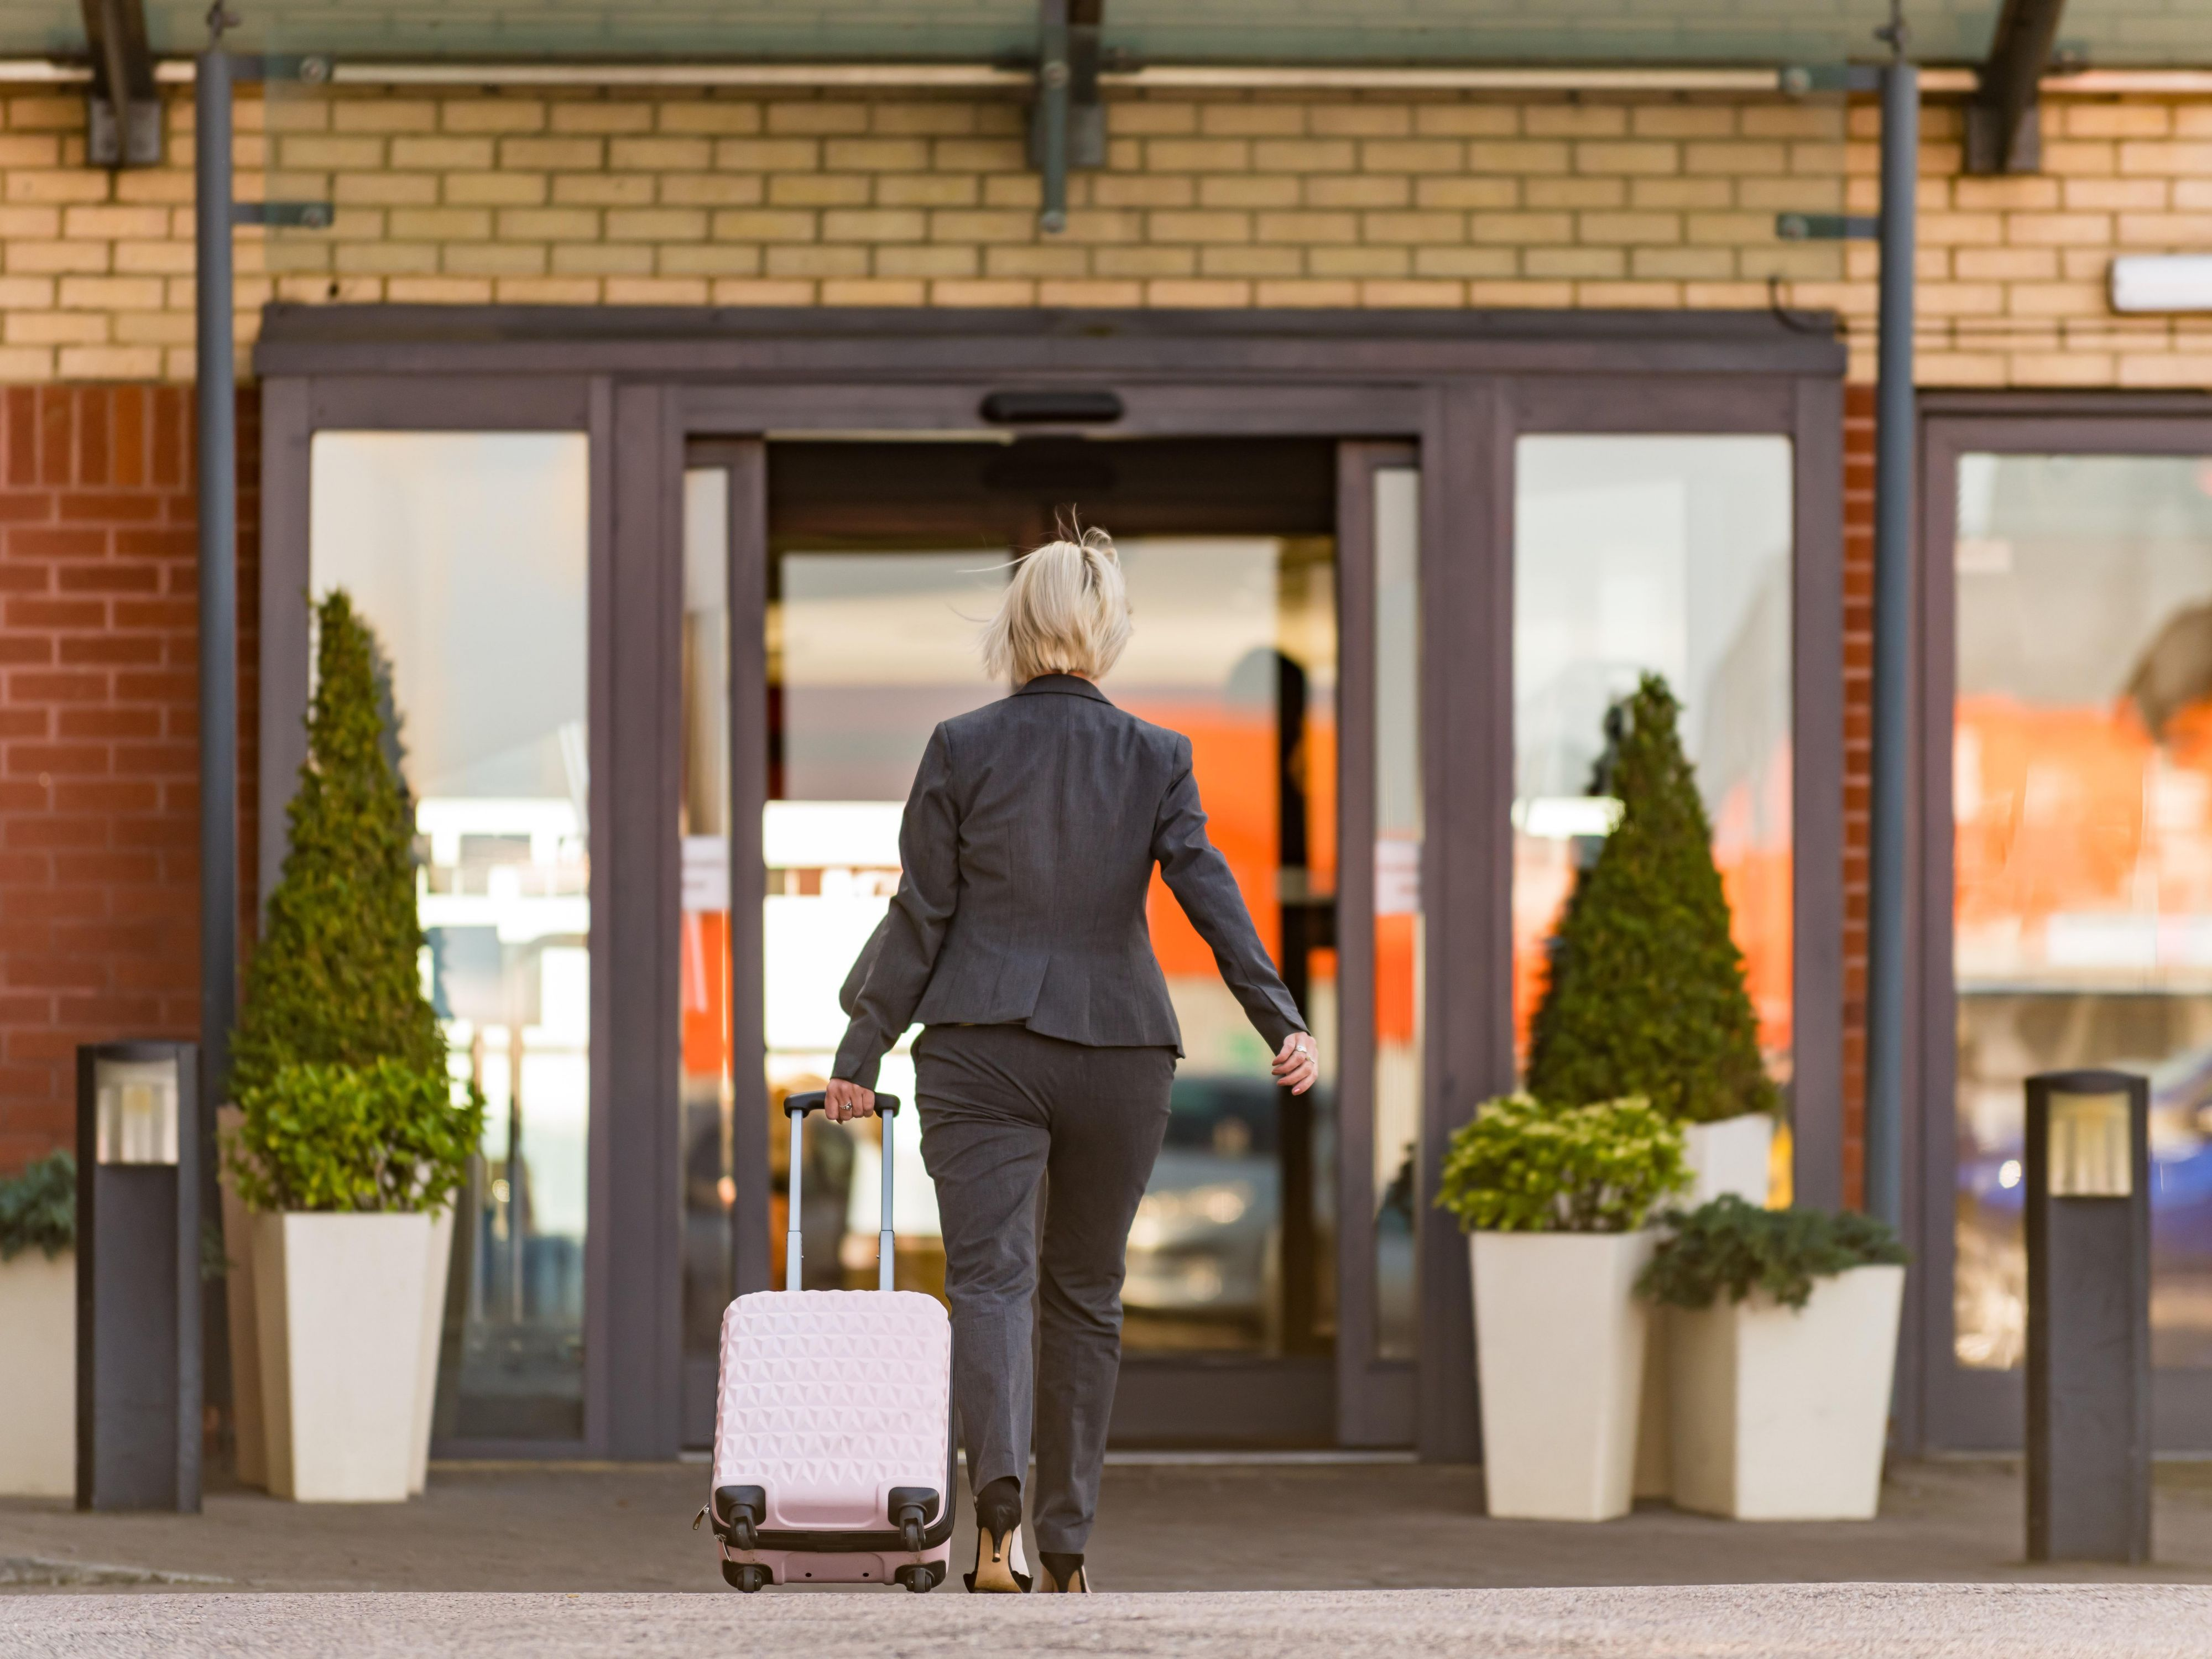 Find London Hotels | Top 94 Hotels in London, United Kingdom